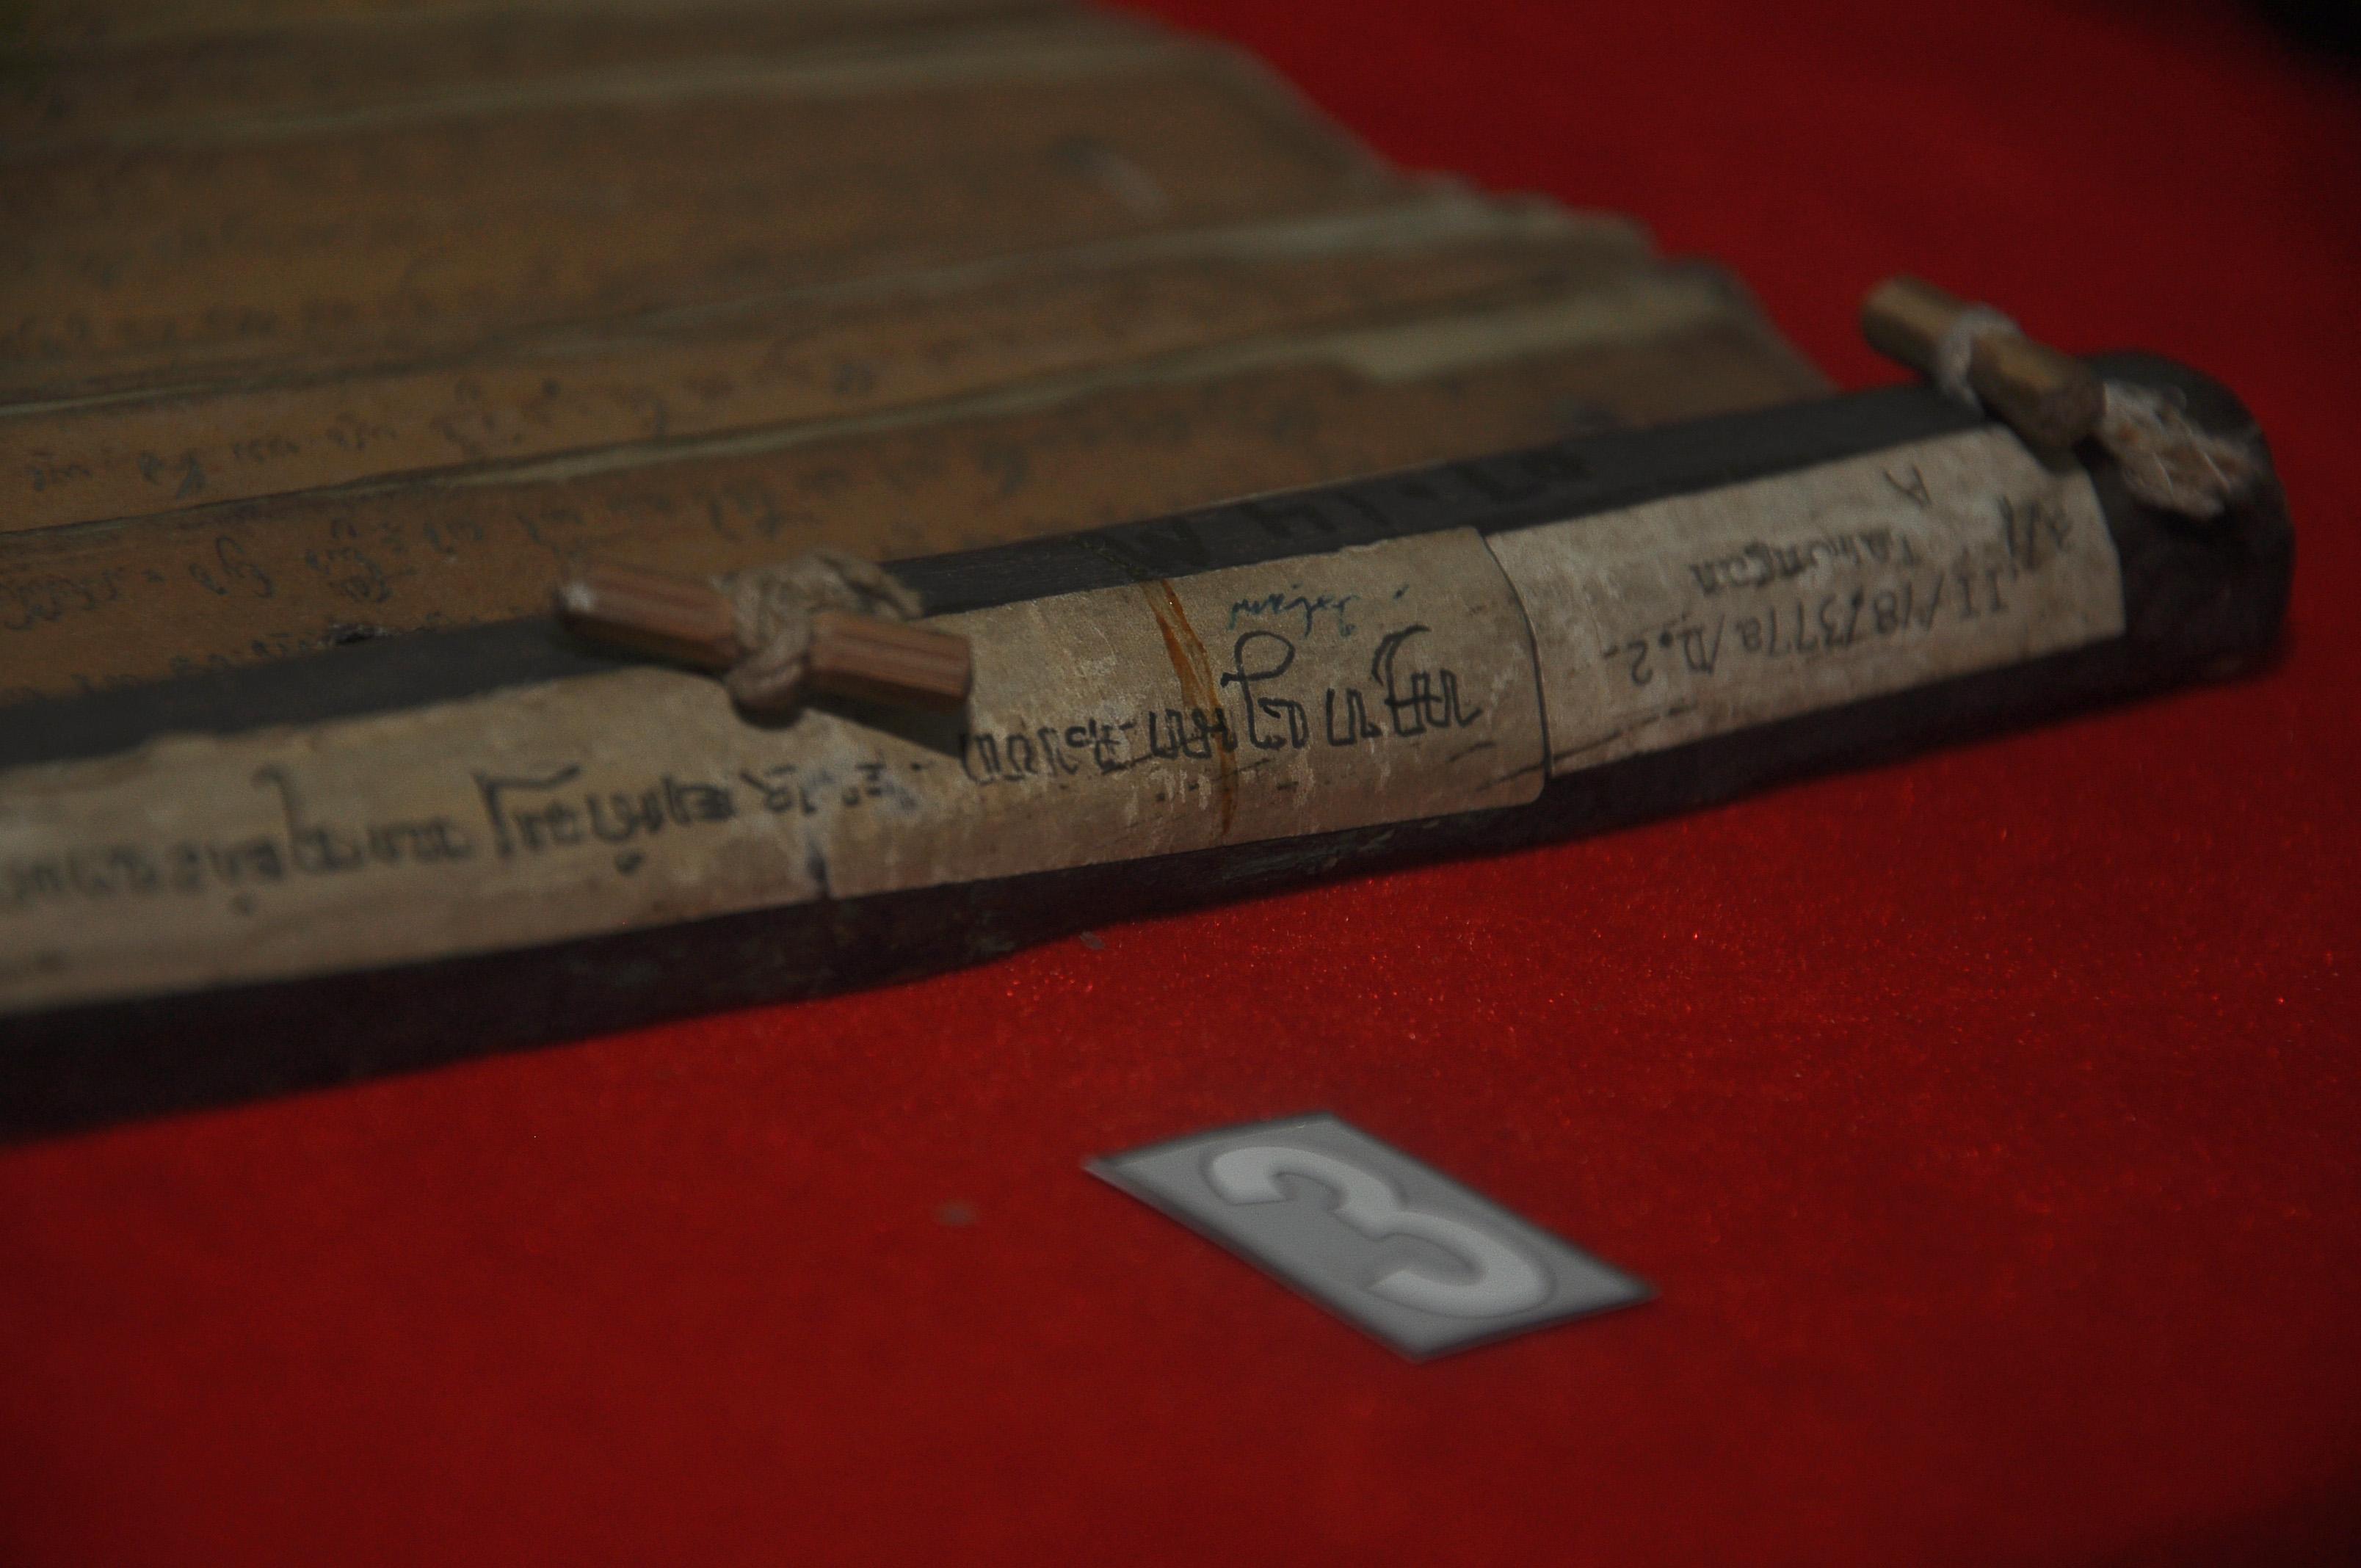 Momen Pekan Museum Mpu Tantular Goresan Foto Naskah Jawa Musium